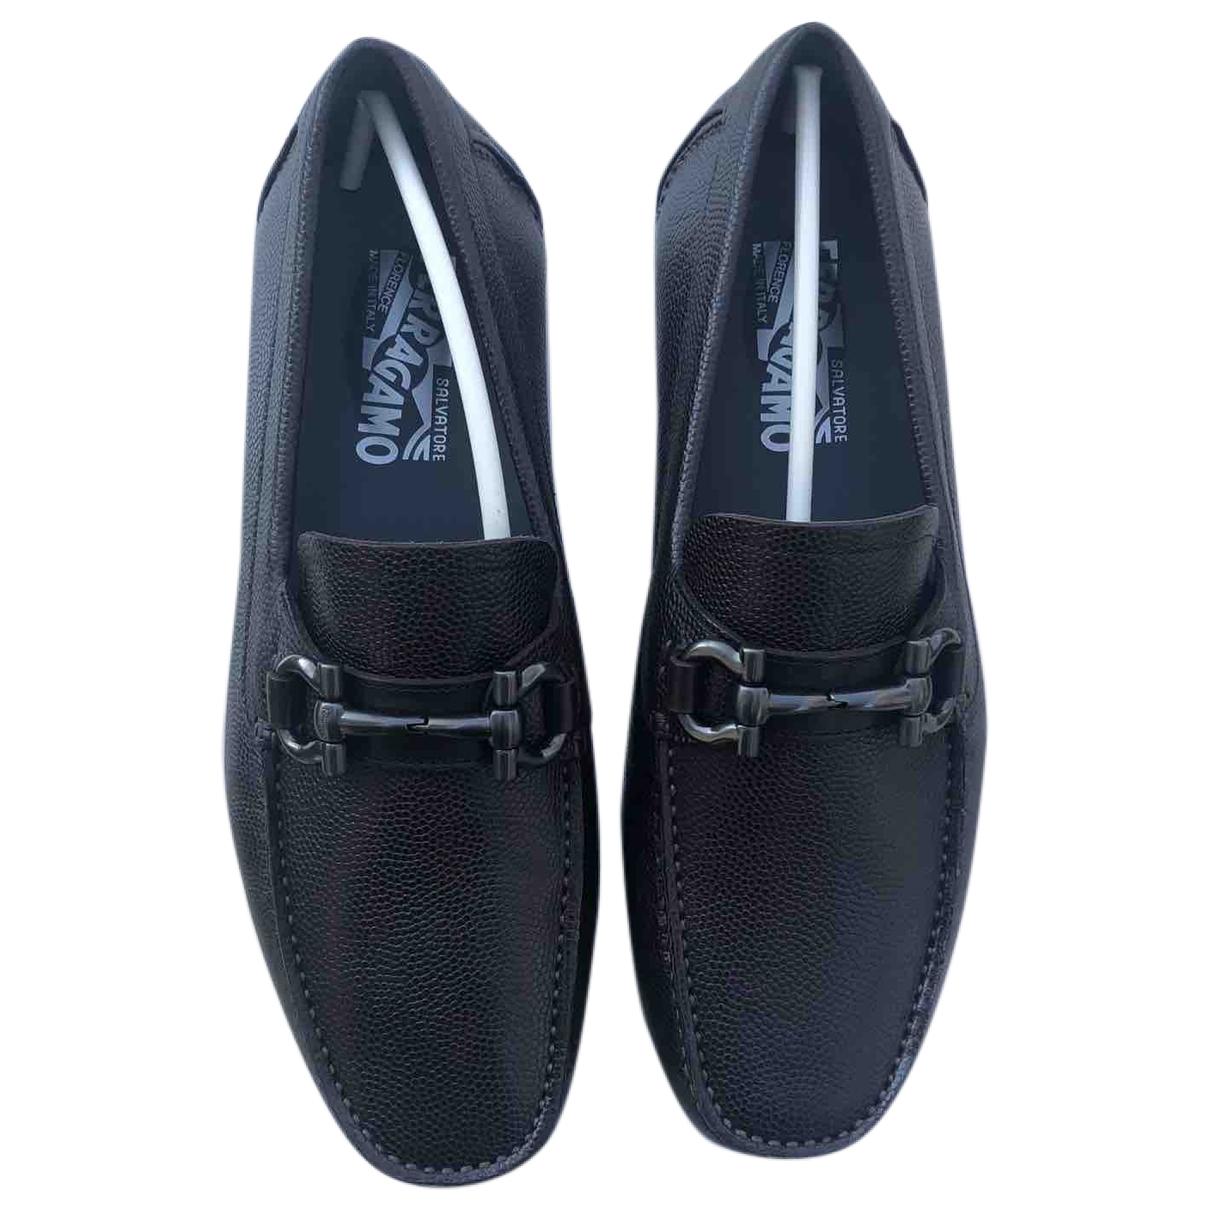 Salvatore Ferragamo Gancini Brown Leather Flats for Men 6.5 US